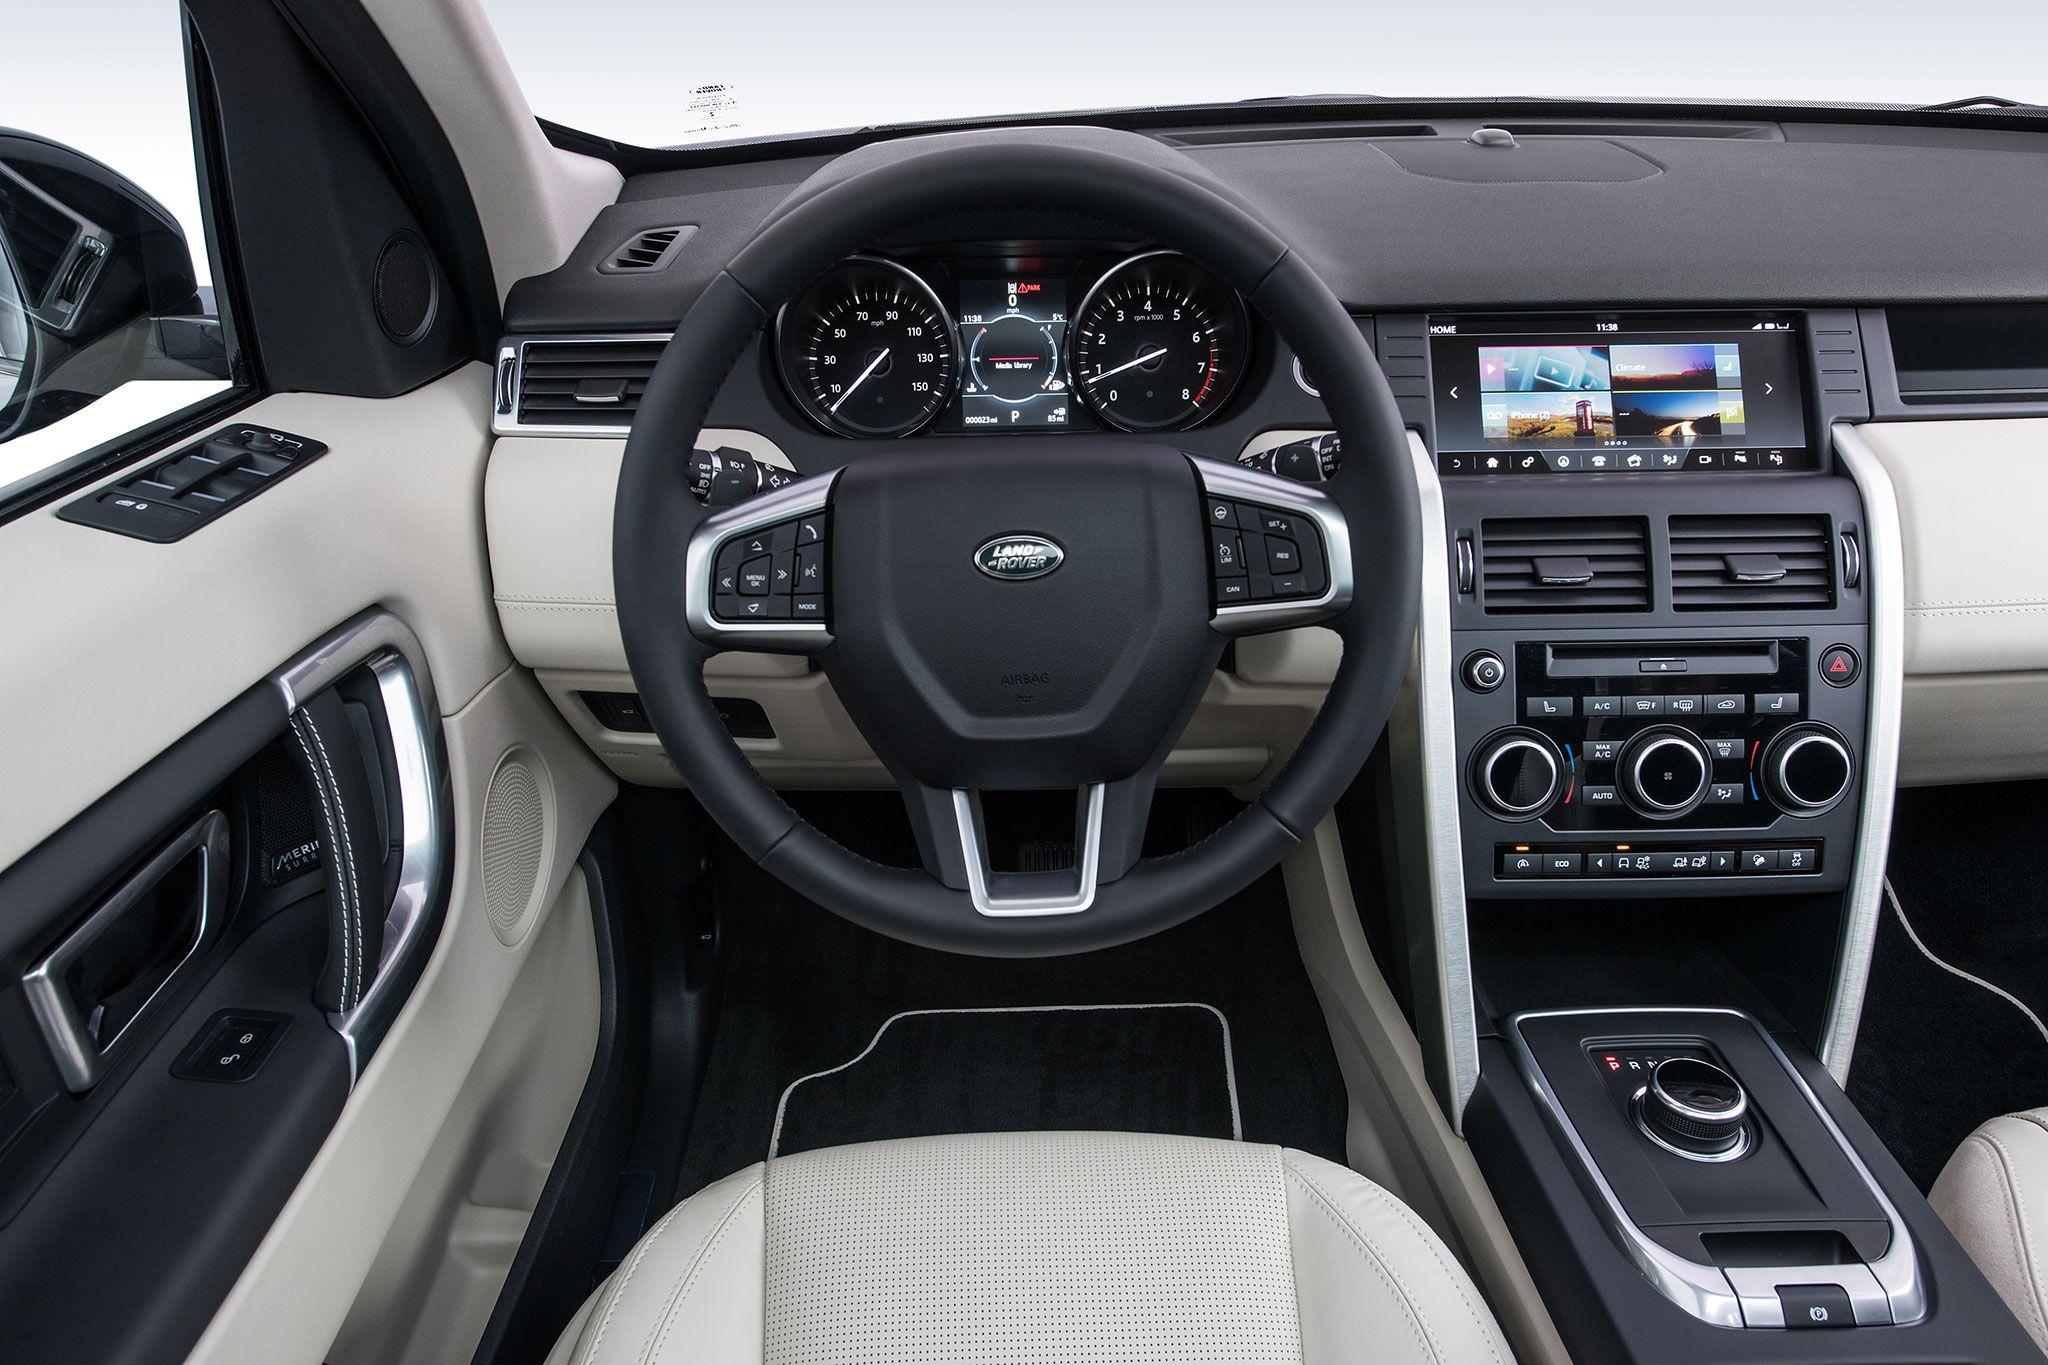 2017 DISCOVERY SPORT Wheels UK Land Rover Pinterest